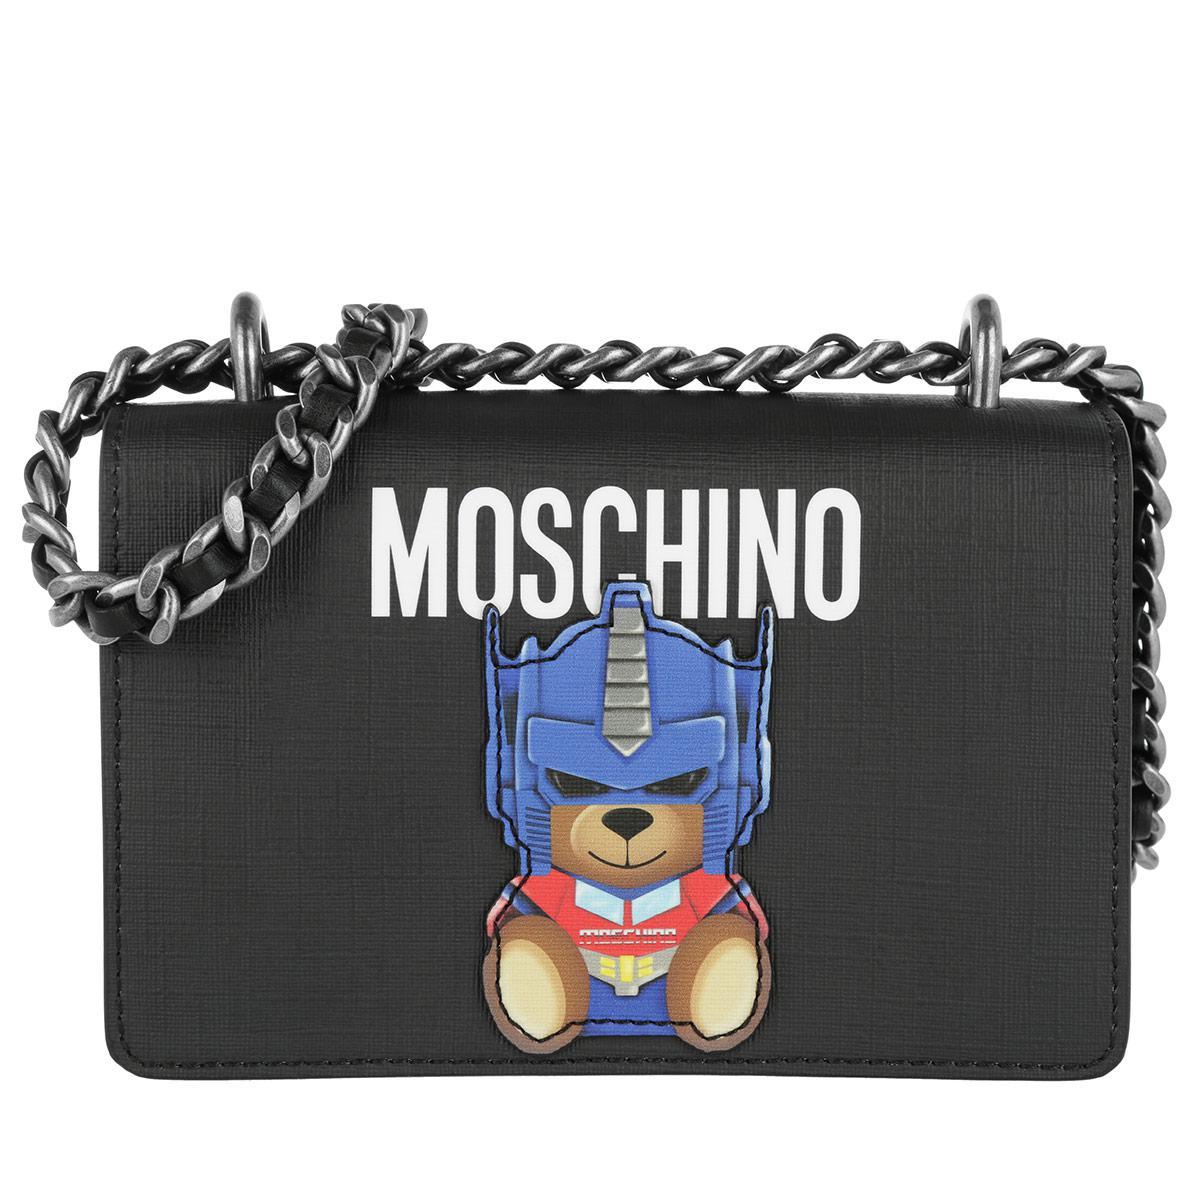 81d8123de1b2 Moschino Transformers Ready To Bear Crossbody Bag Black in Black - Lyst